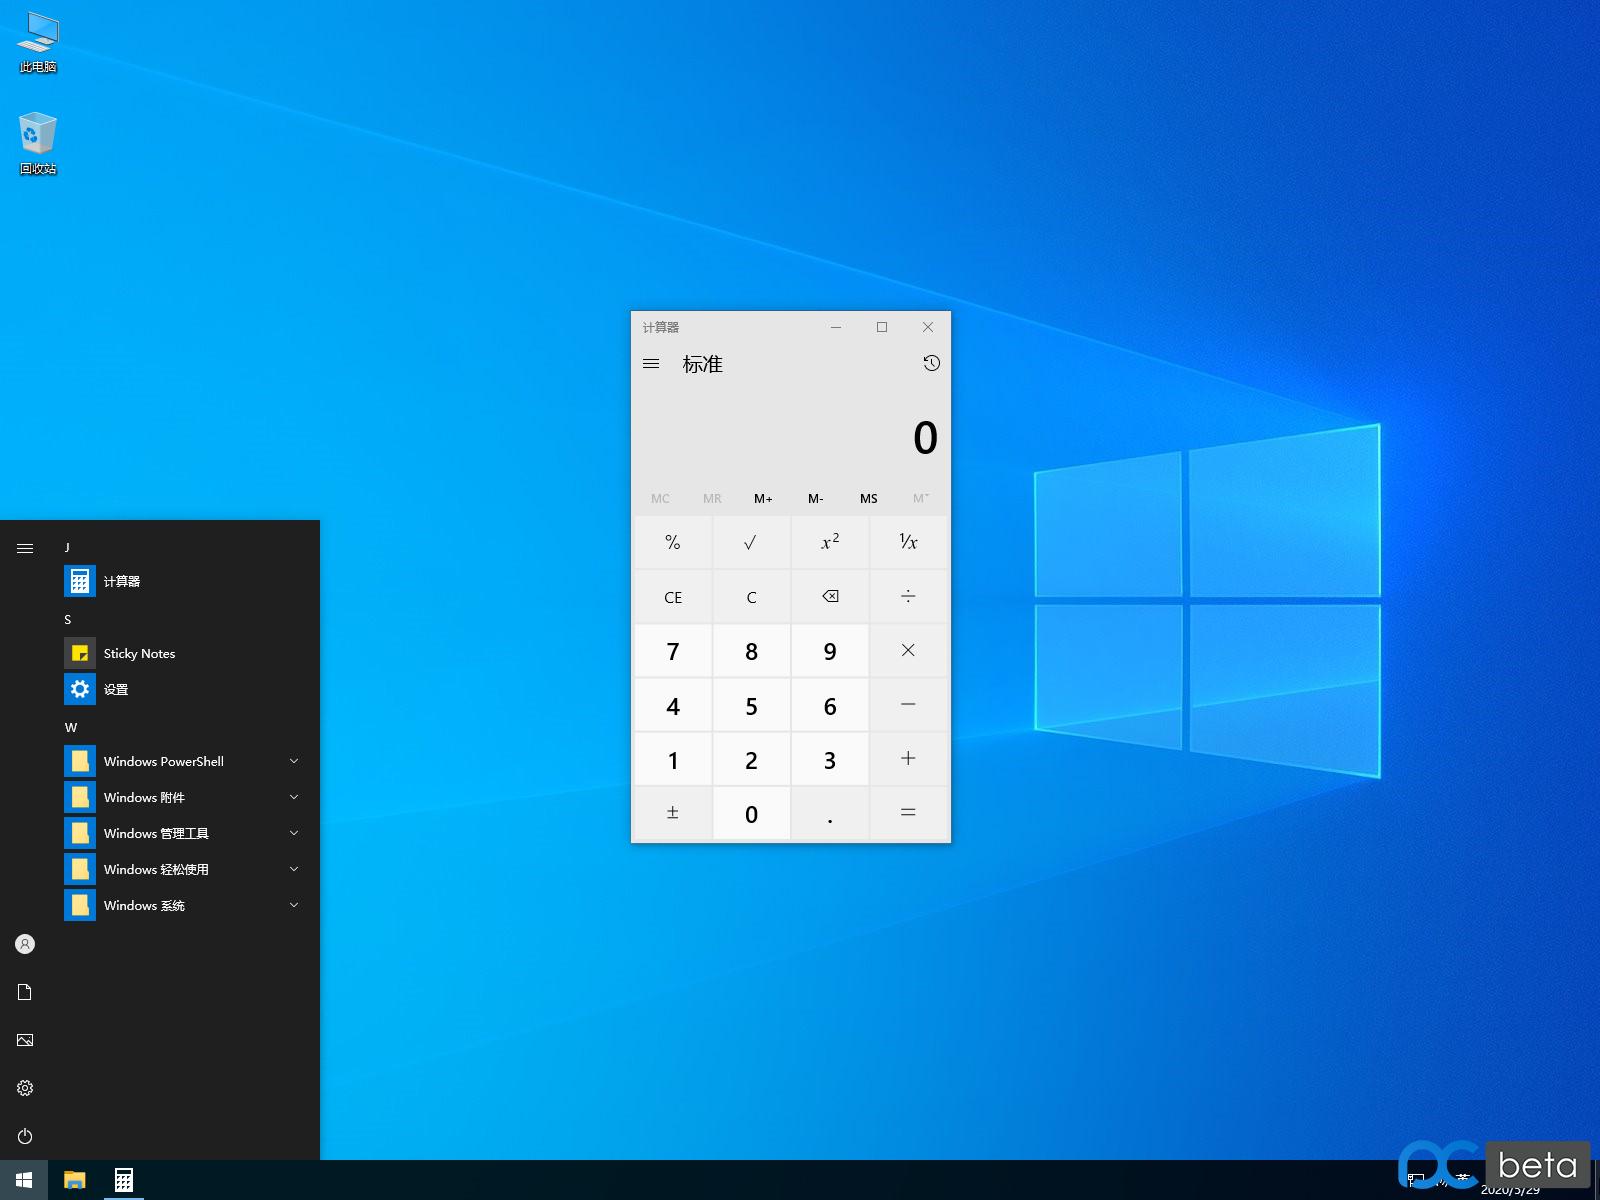 【金黑凤凰】Windows 10 2004 Pro for Workstations 19041.388[32&64bit]双模版20200716